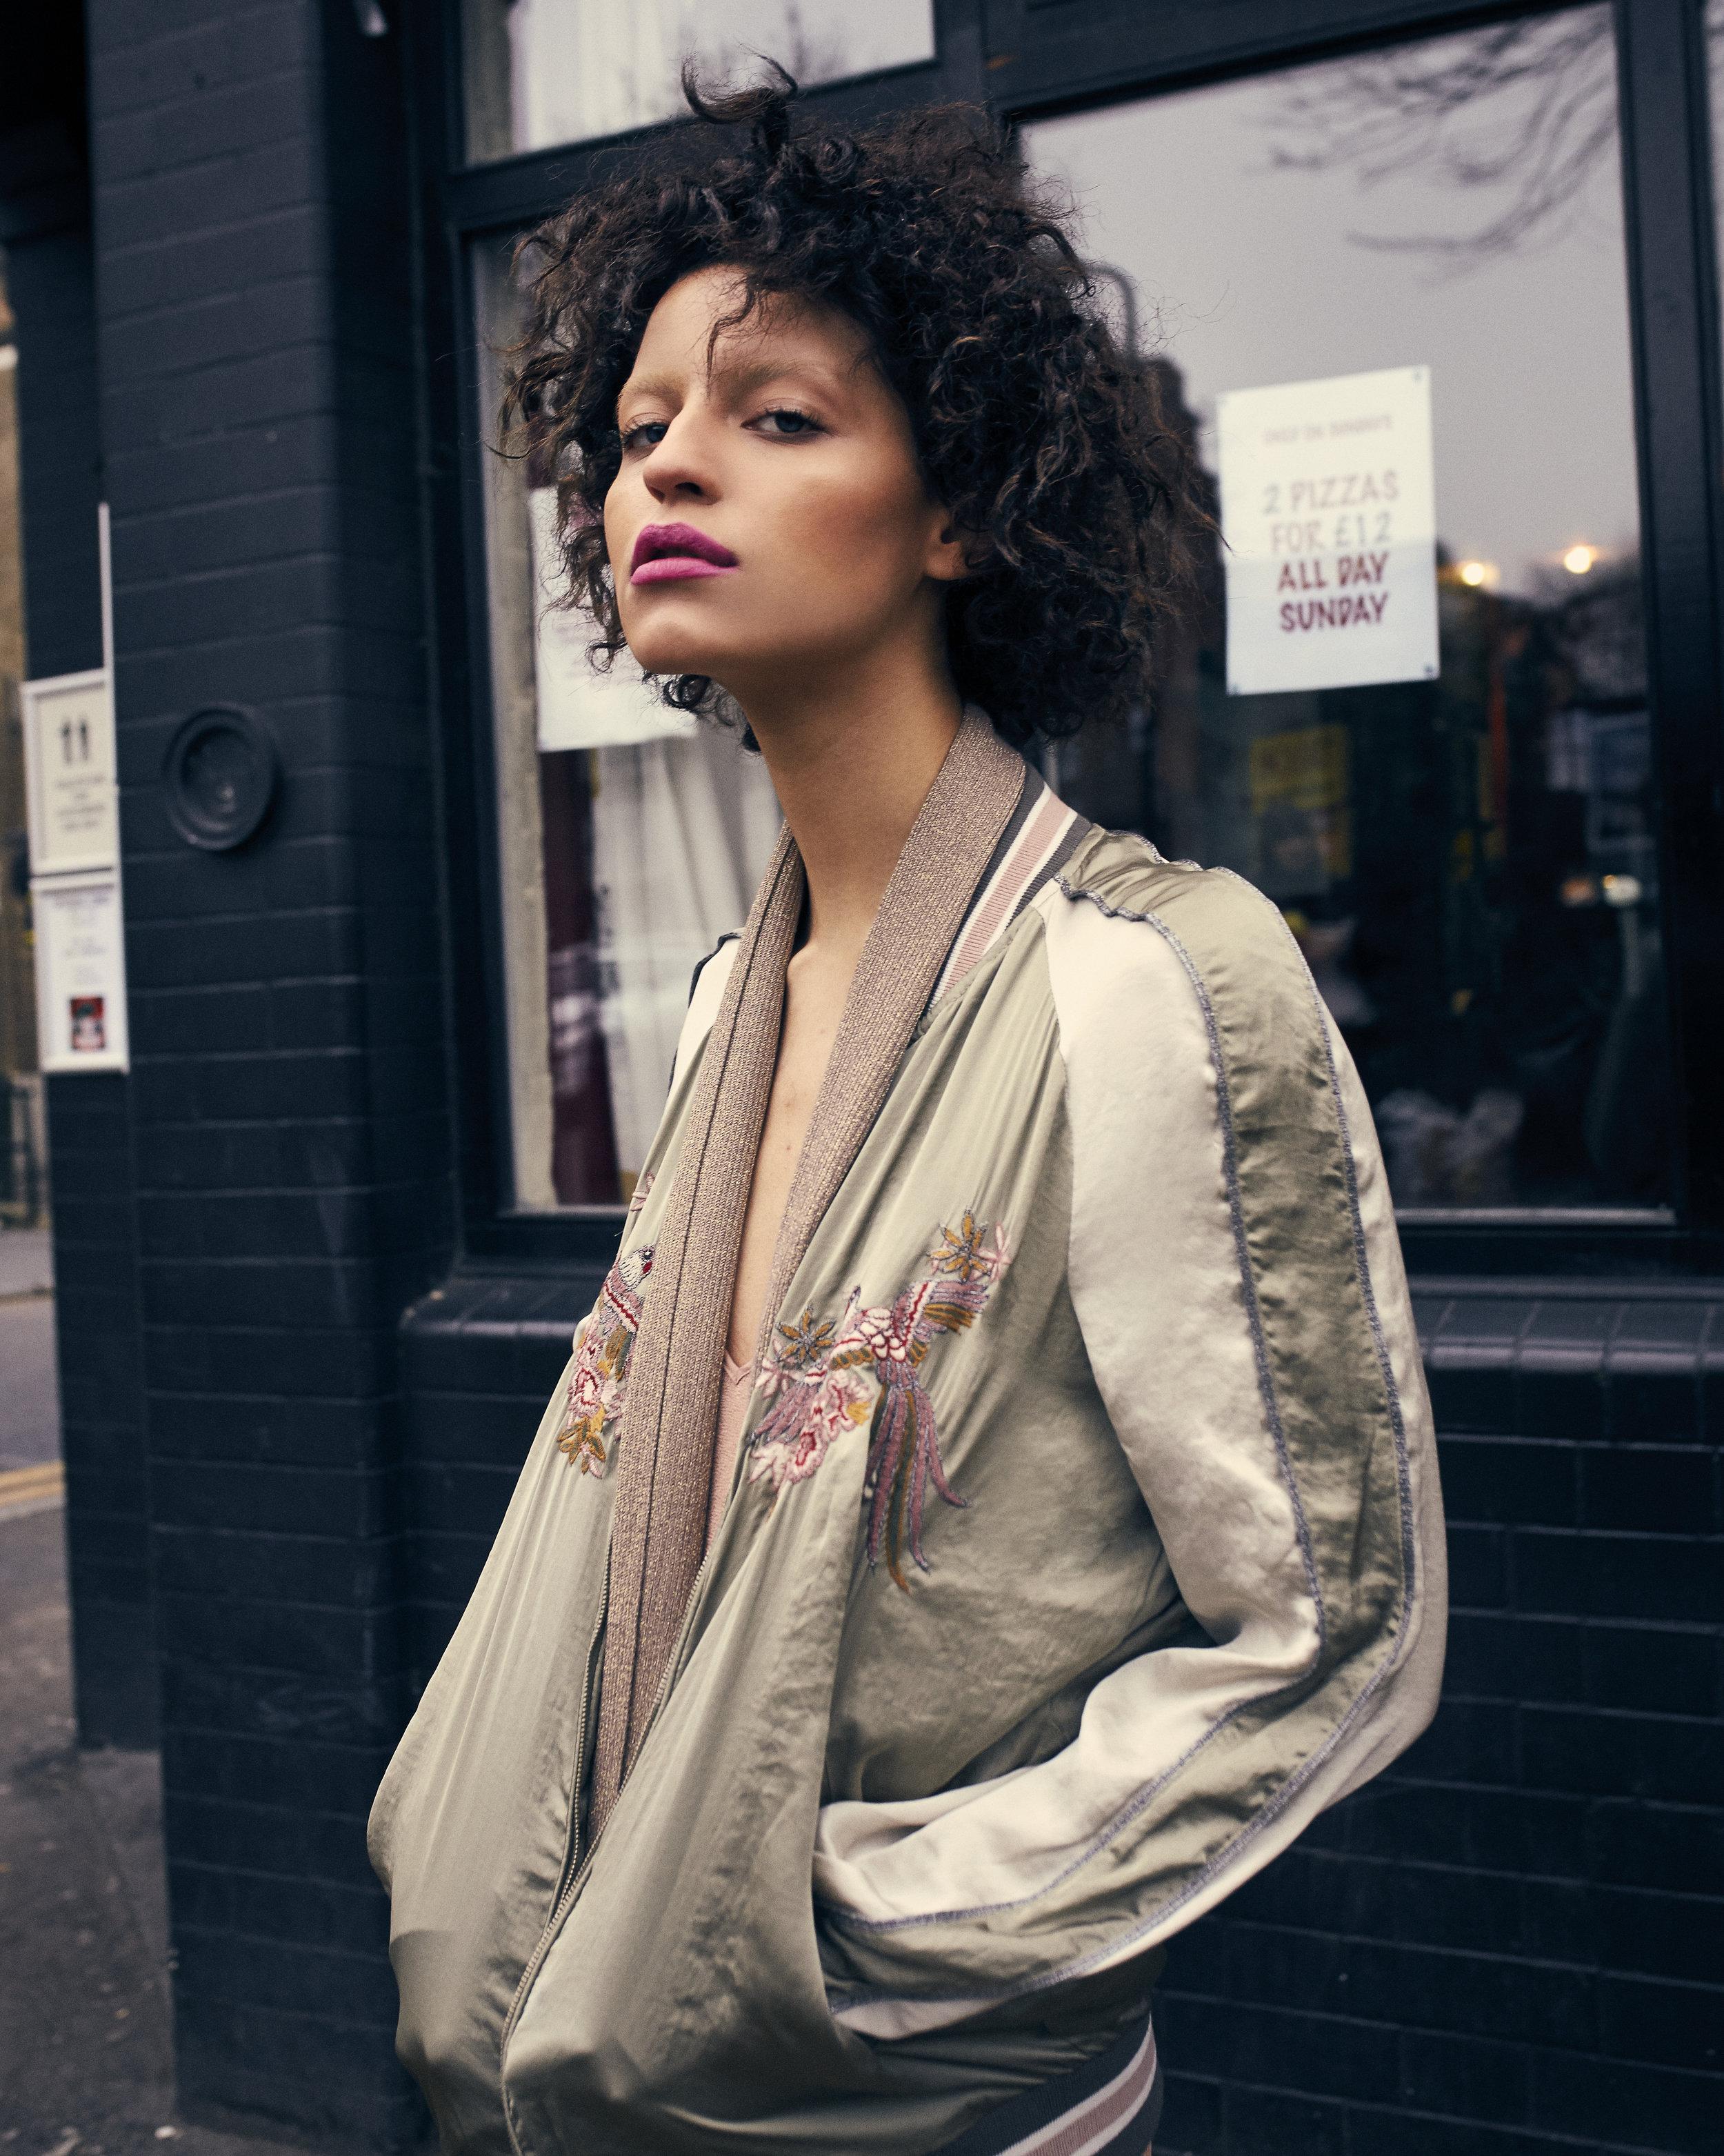 Jacket: Zara